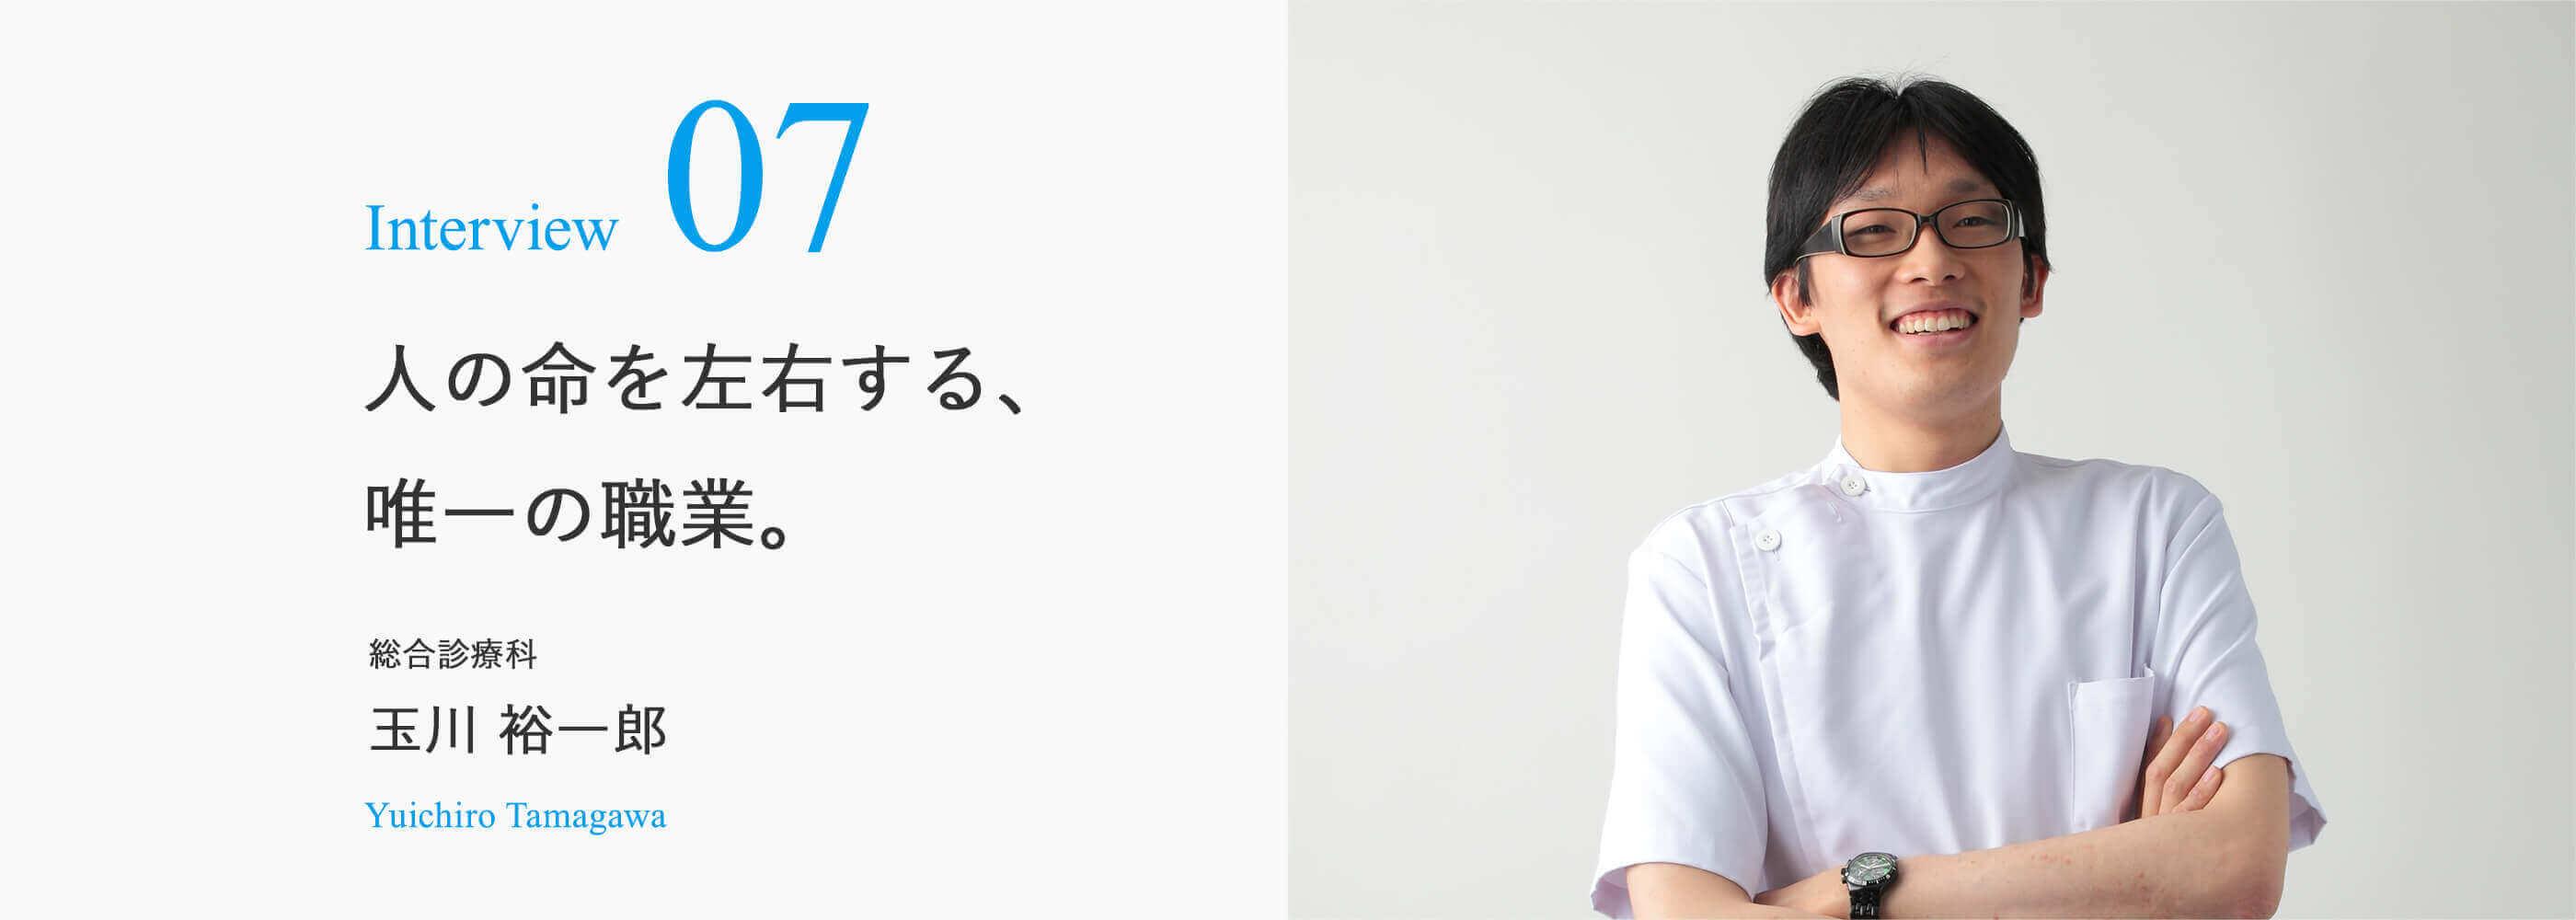 Interview 07 人の命を左右する、 唯一の職業。総合診療科 玉川 裕一郎